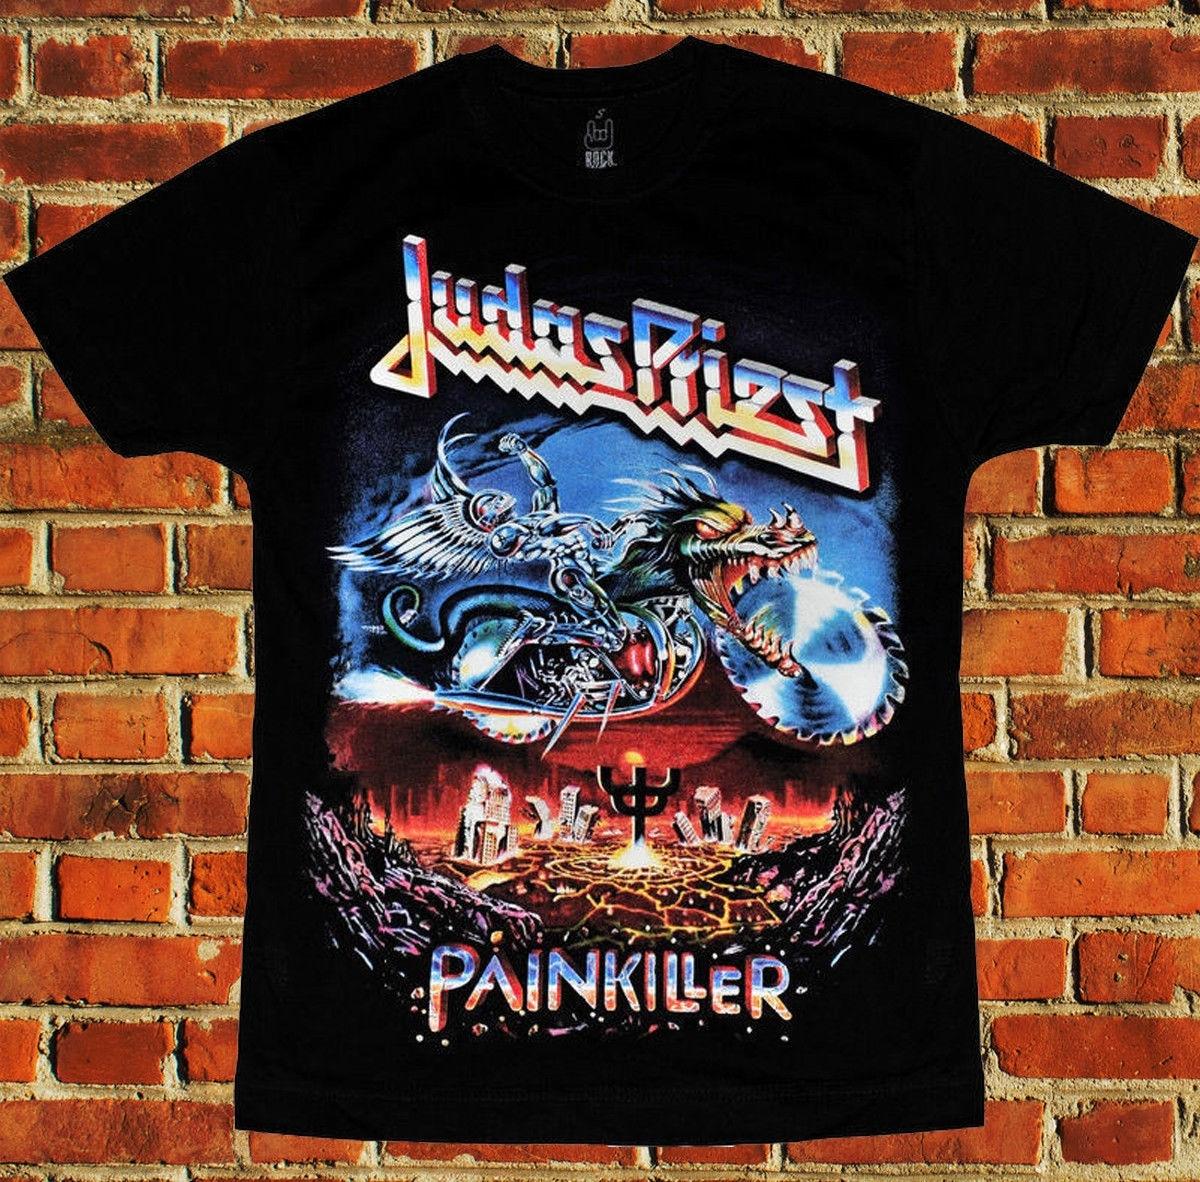 Haree hard rock punk metal banda judas priest paintkiller nova moda casual algodão manga curta carta topo t